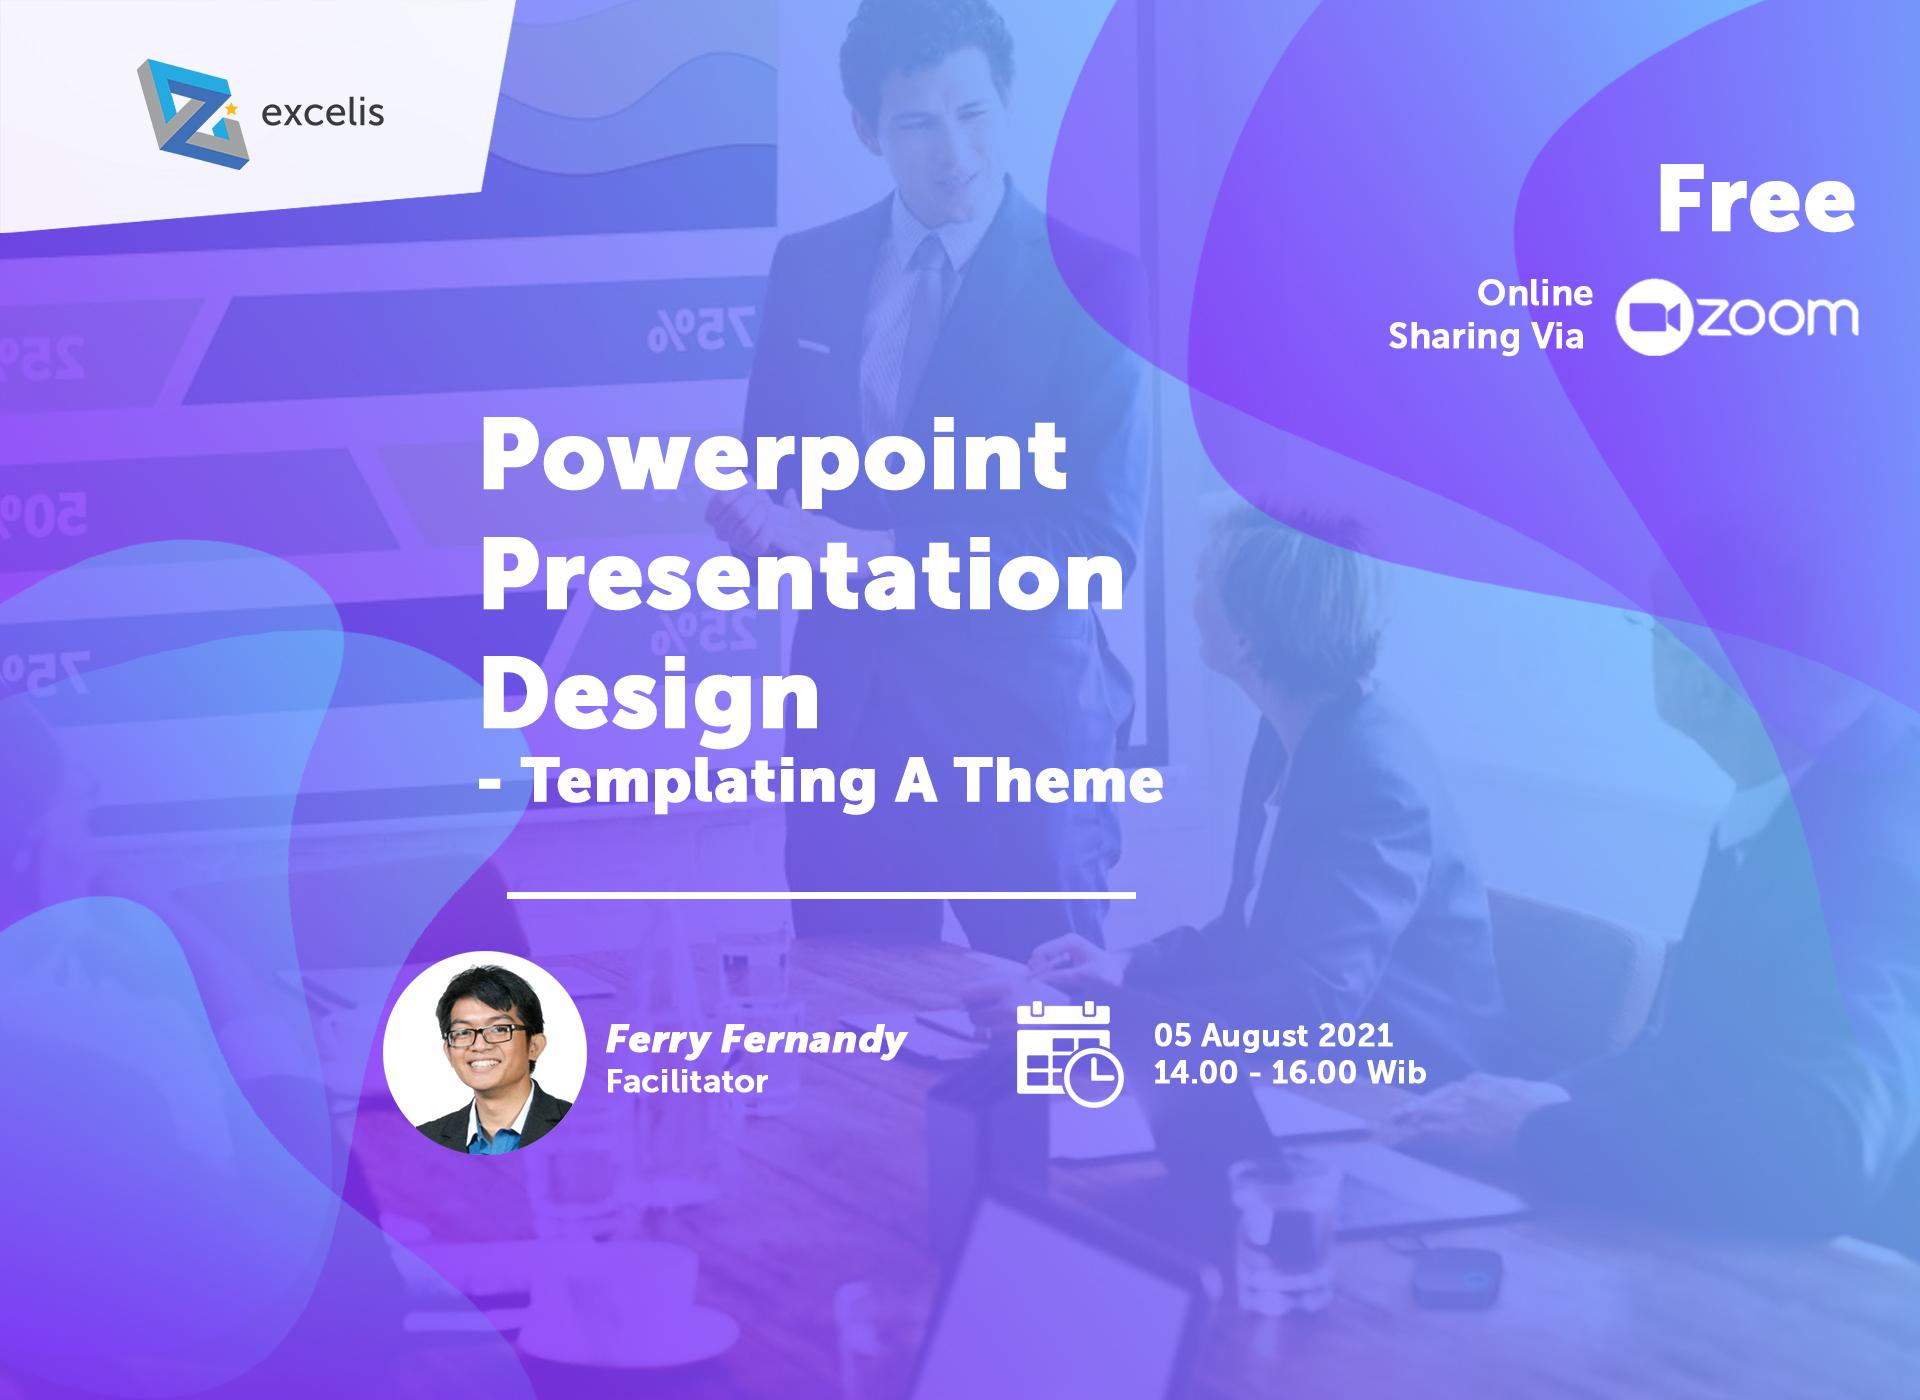 Powerpoint Presentation Design – Templating A Theme – 05 Aug 2021